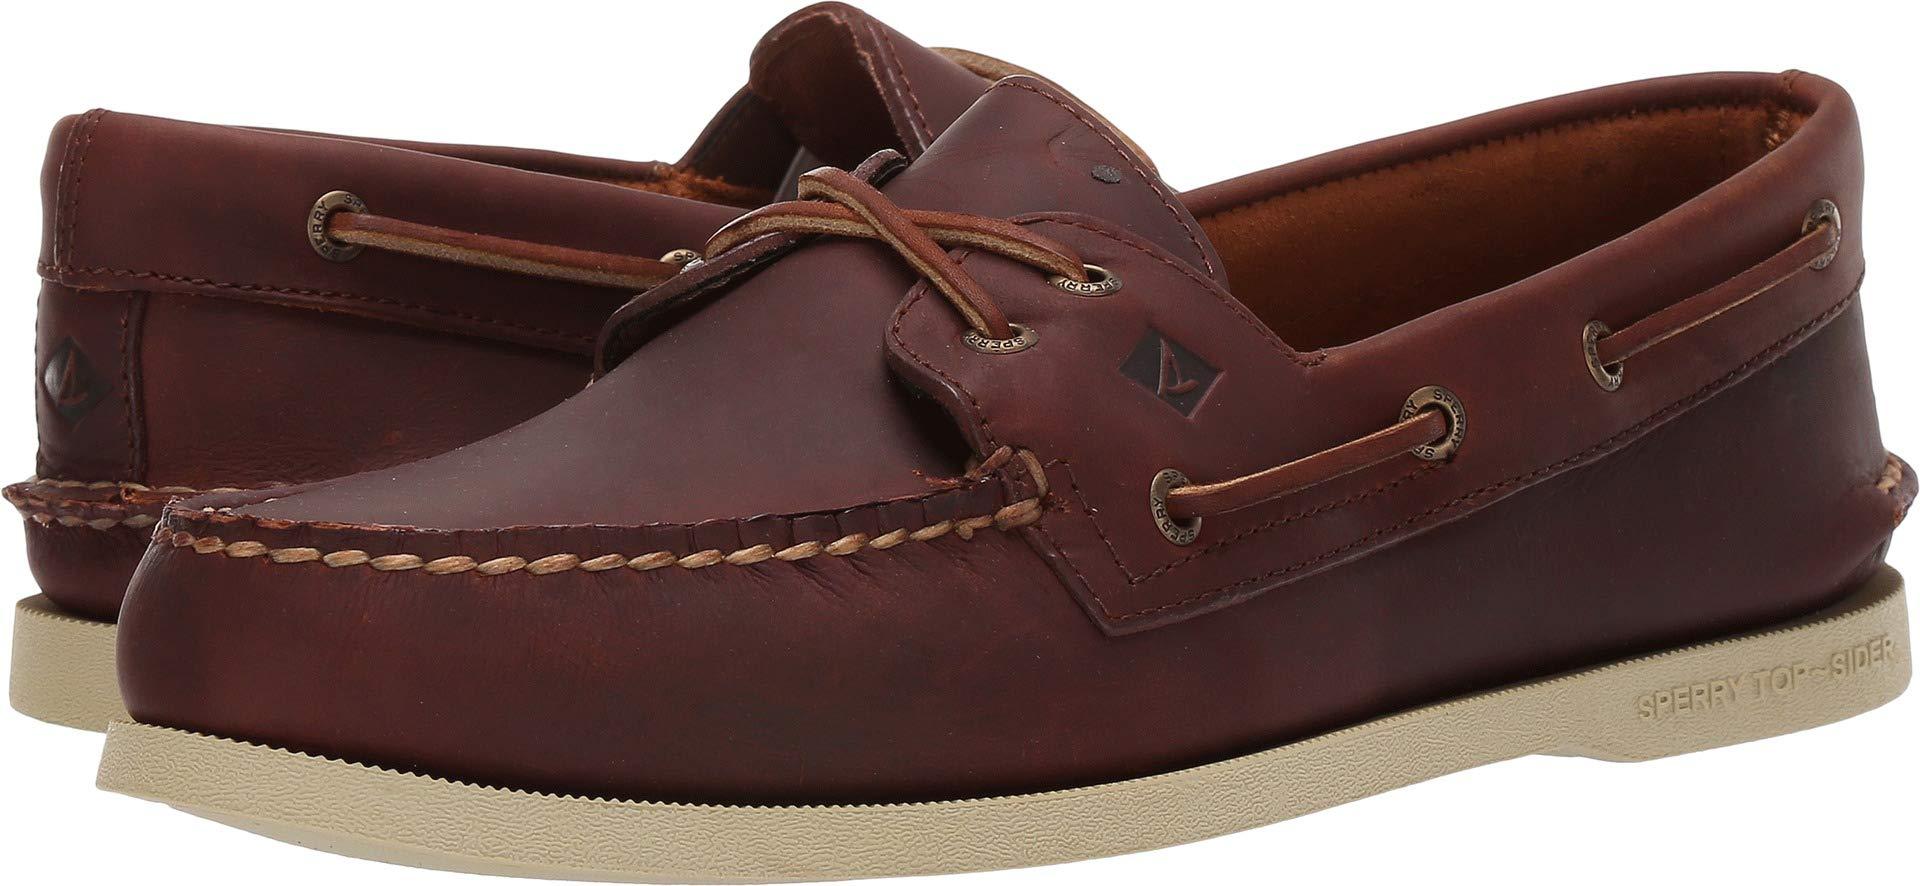 Men's Sperry Topsider, Authentic Original Boat Shoe Dark TAN 10 M